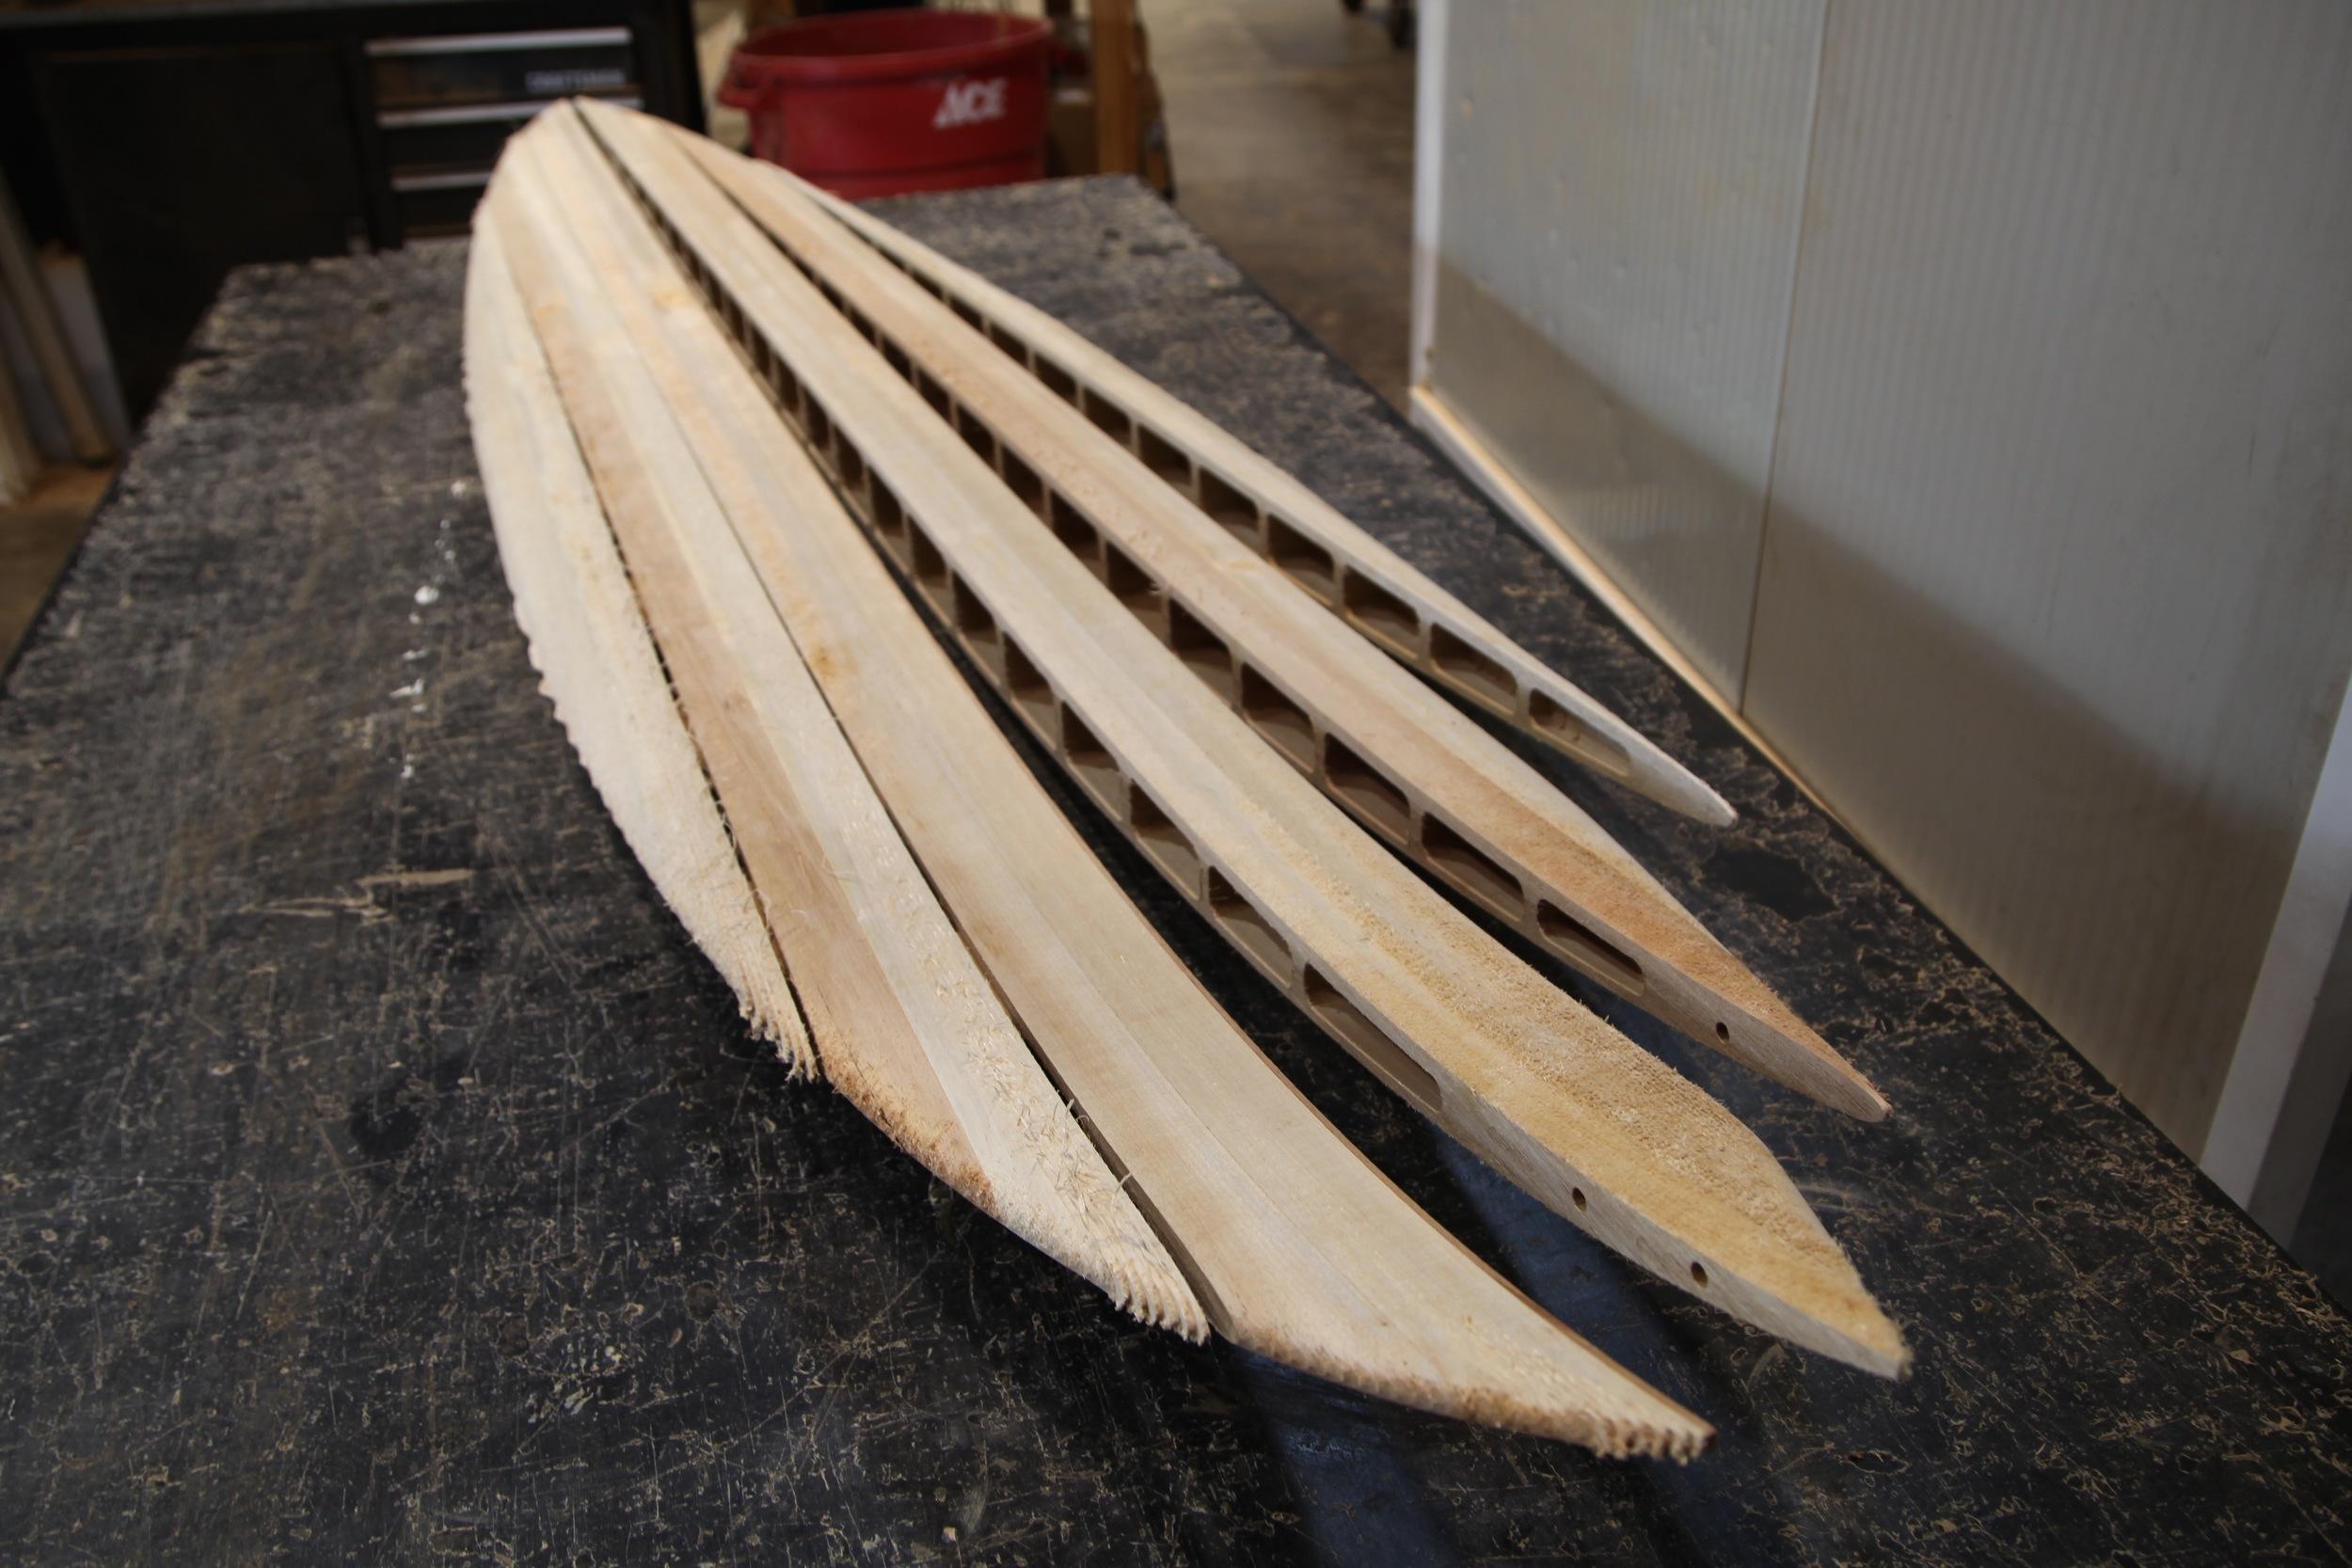 Partially Assembled Surfboard